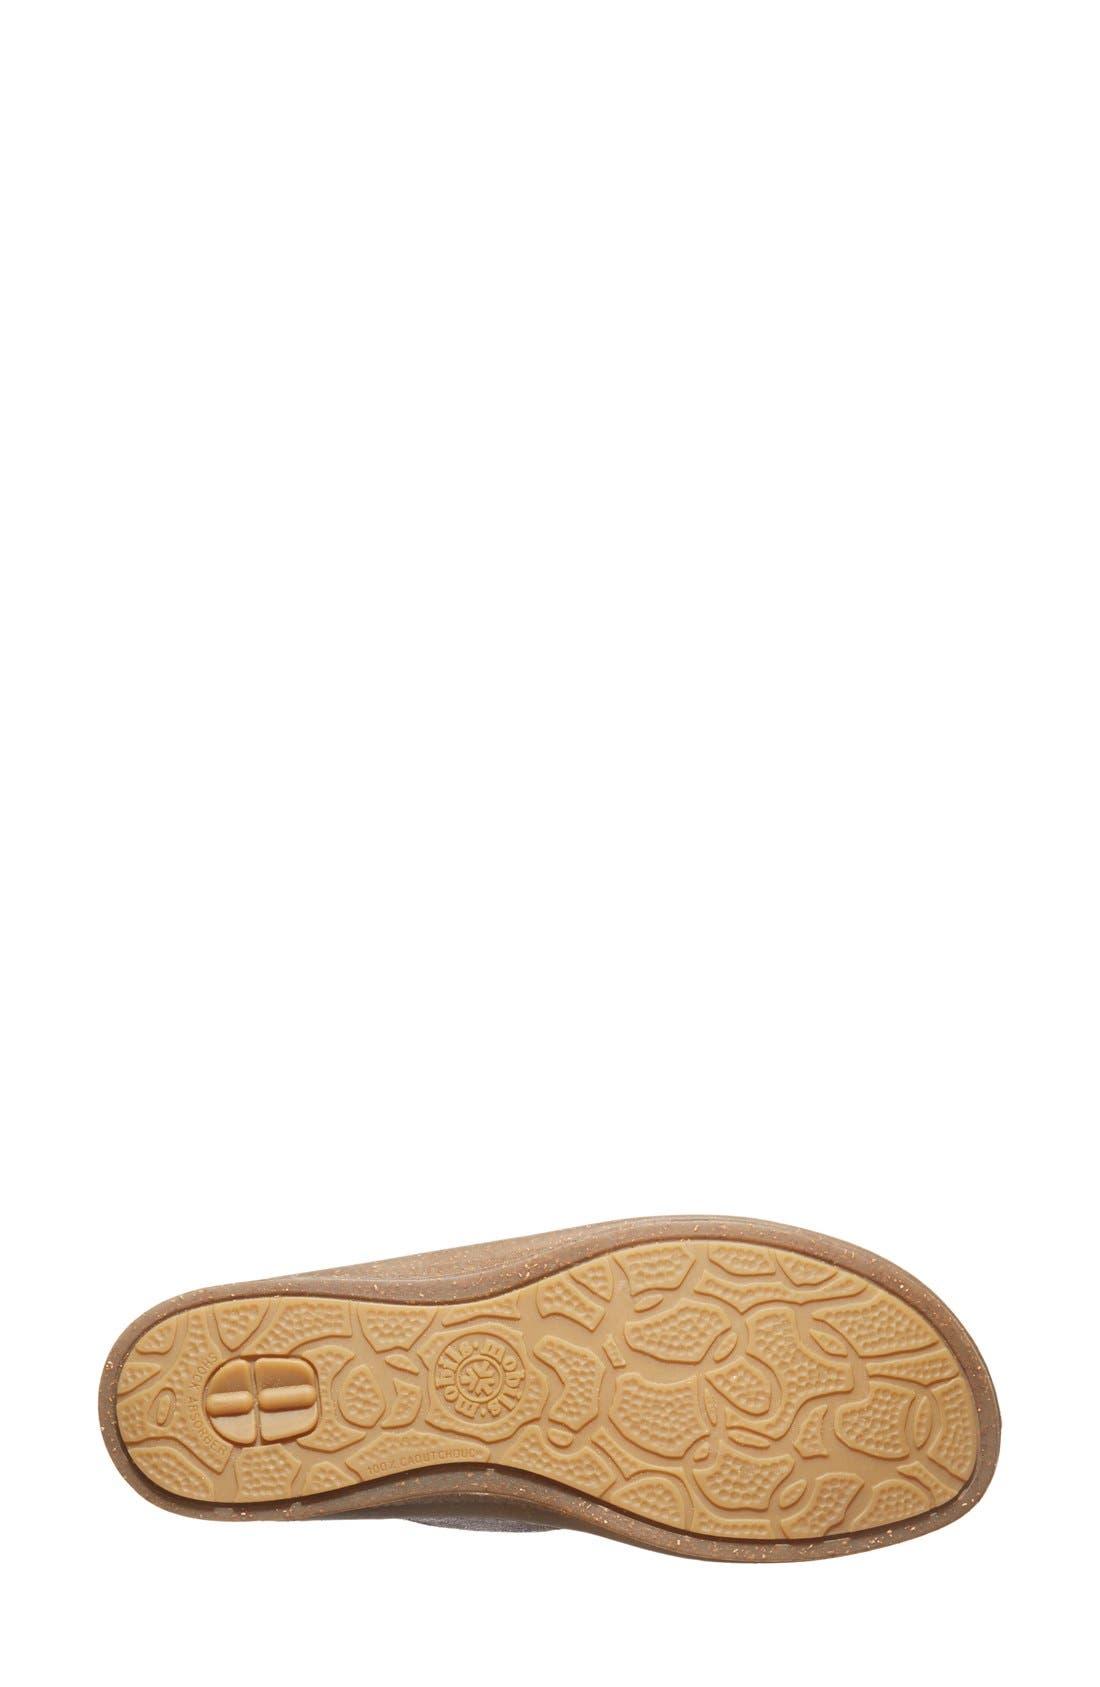 Alternate Image 4  - Mephisto 'Bregalia' Metallic Leather Sandal (Women)